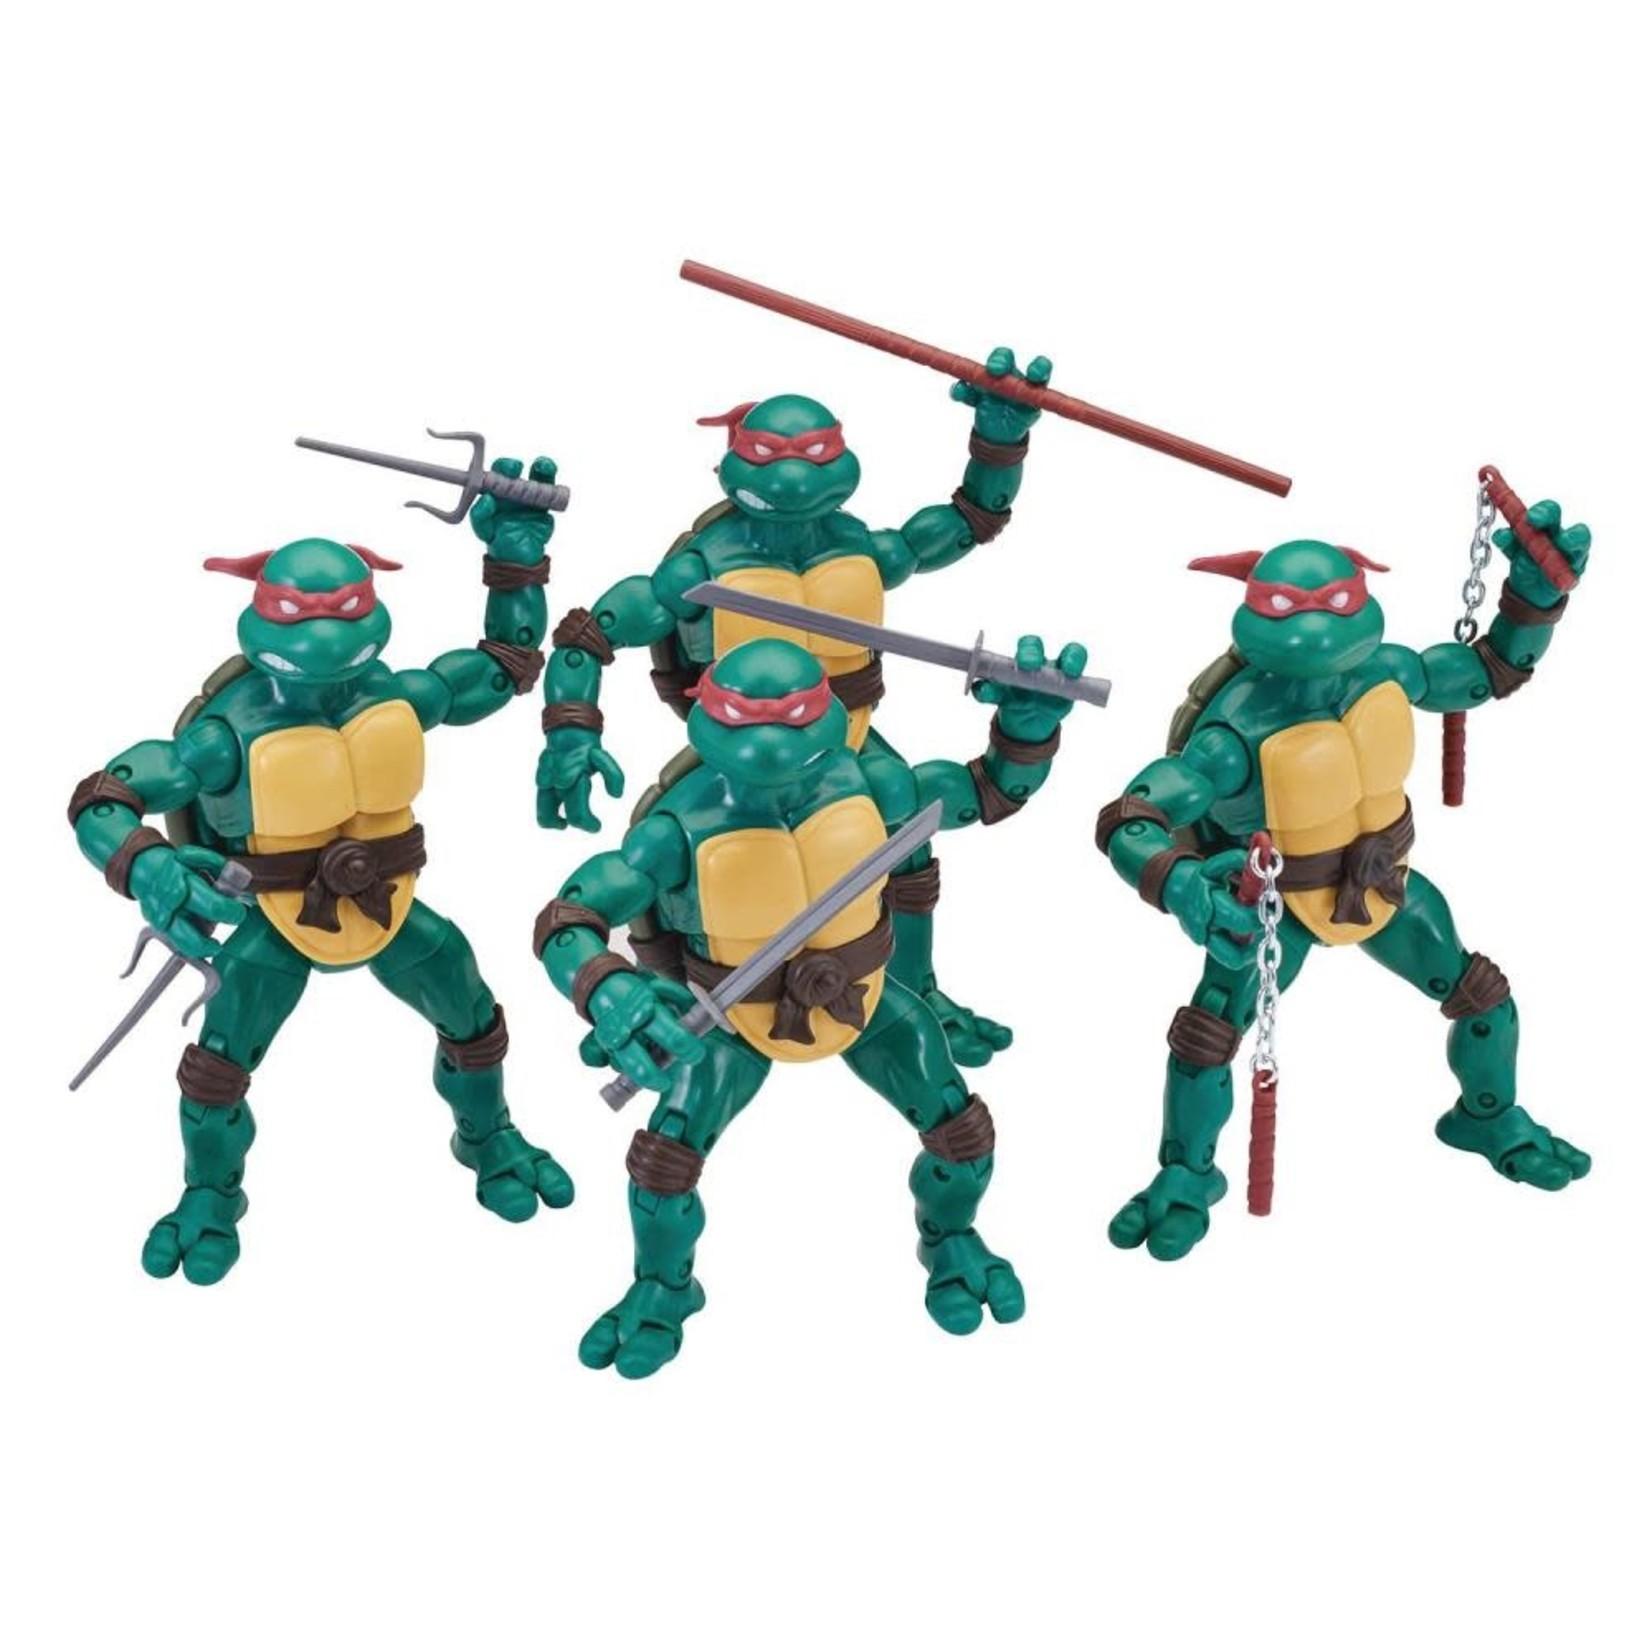 playmates TMNT Ninja Elite Series PX Previews Exclusive - Raphael